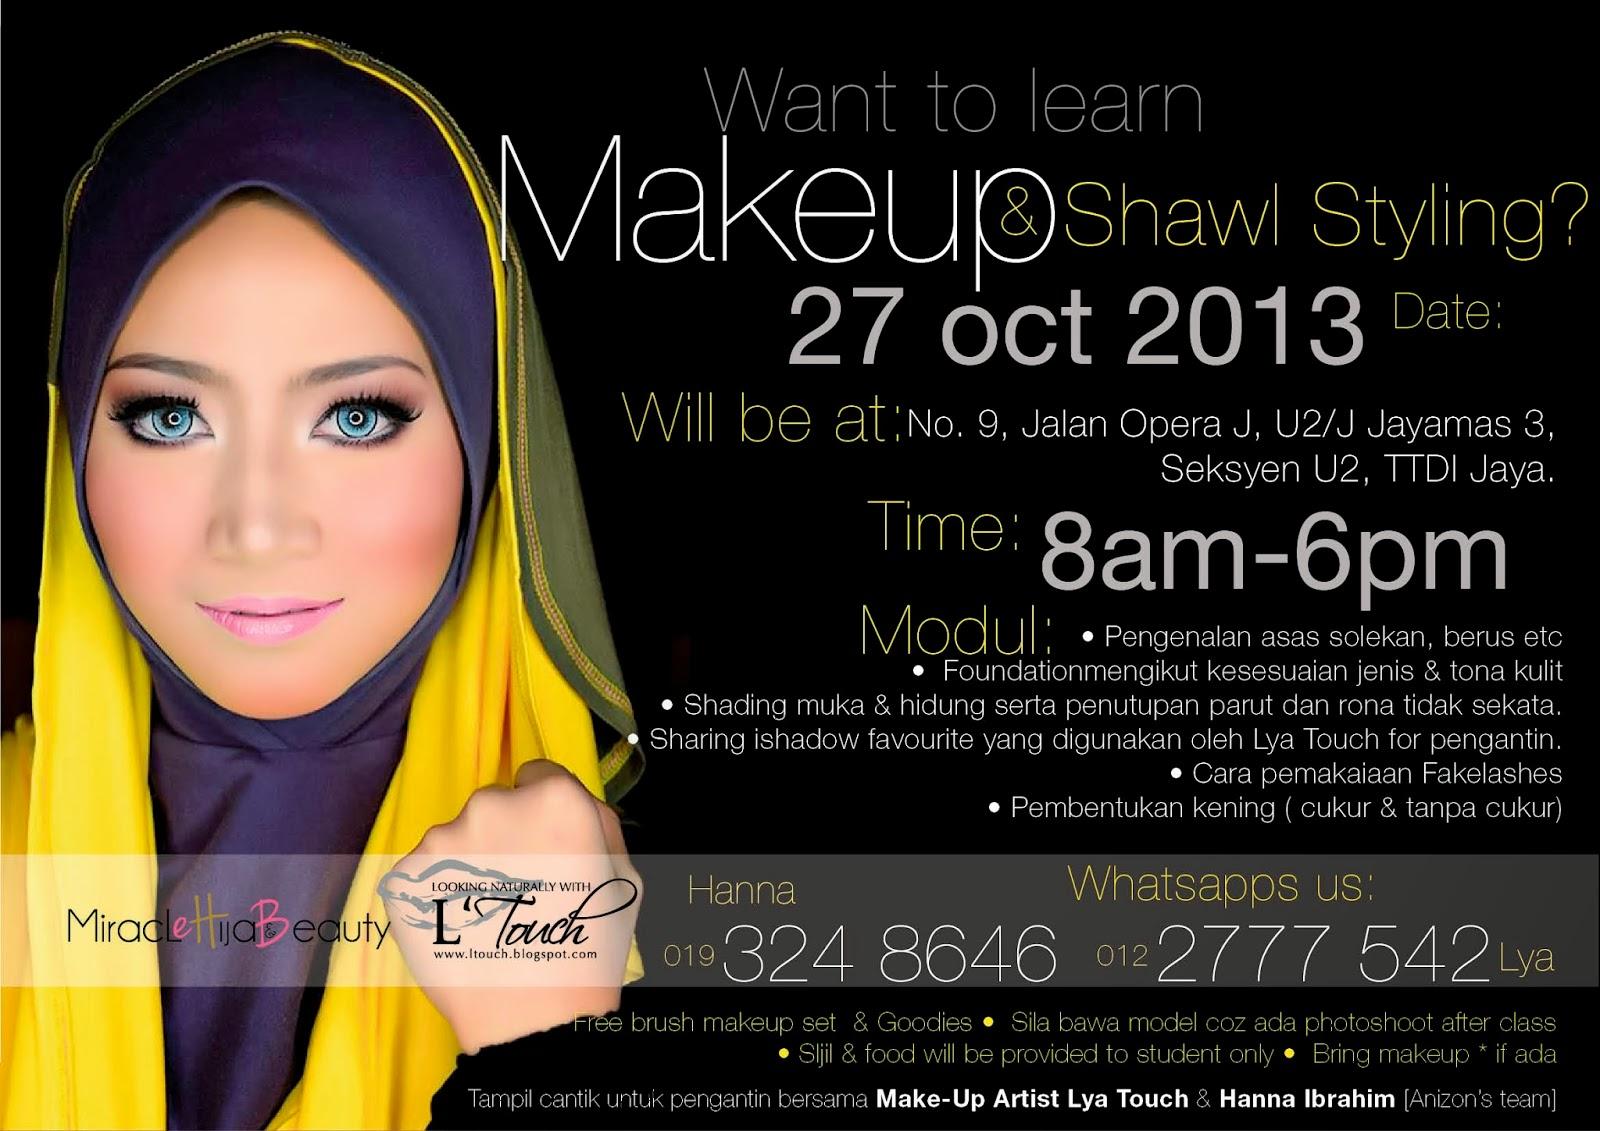 make up artist l touch andaman pengantin 012 2777 542